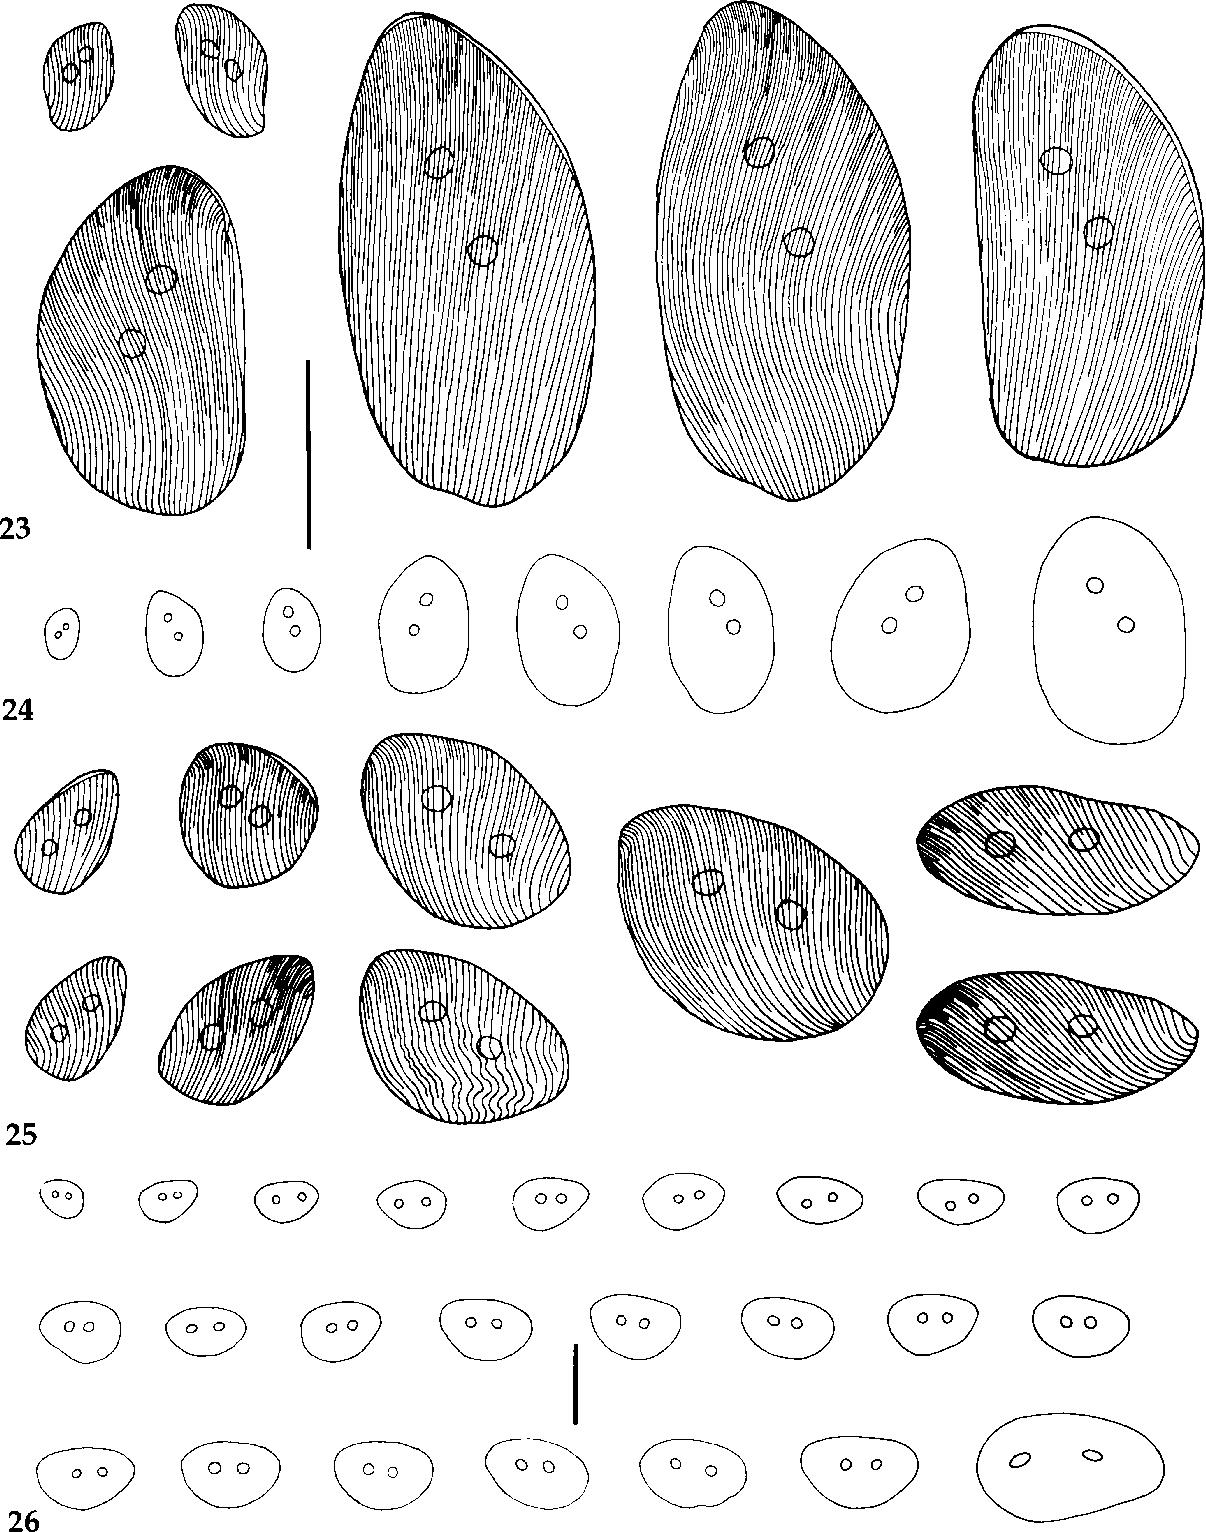 figure 23-26